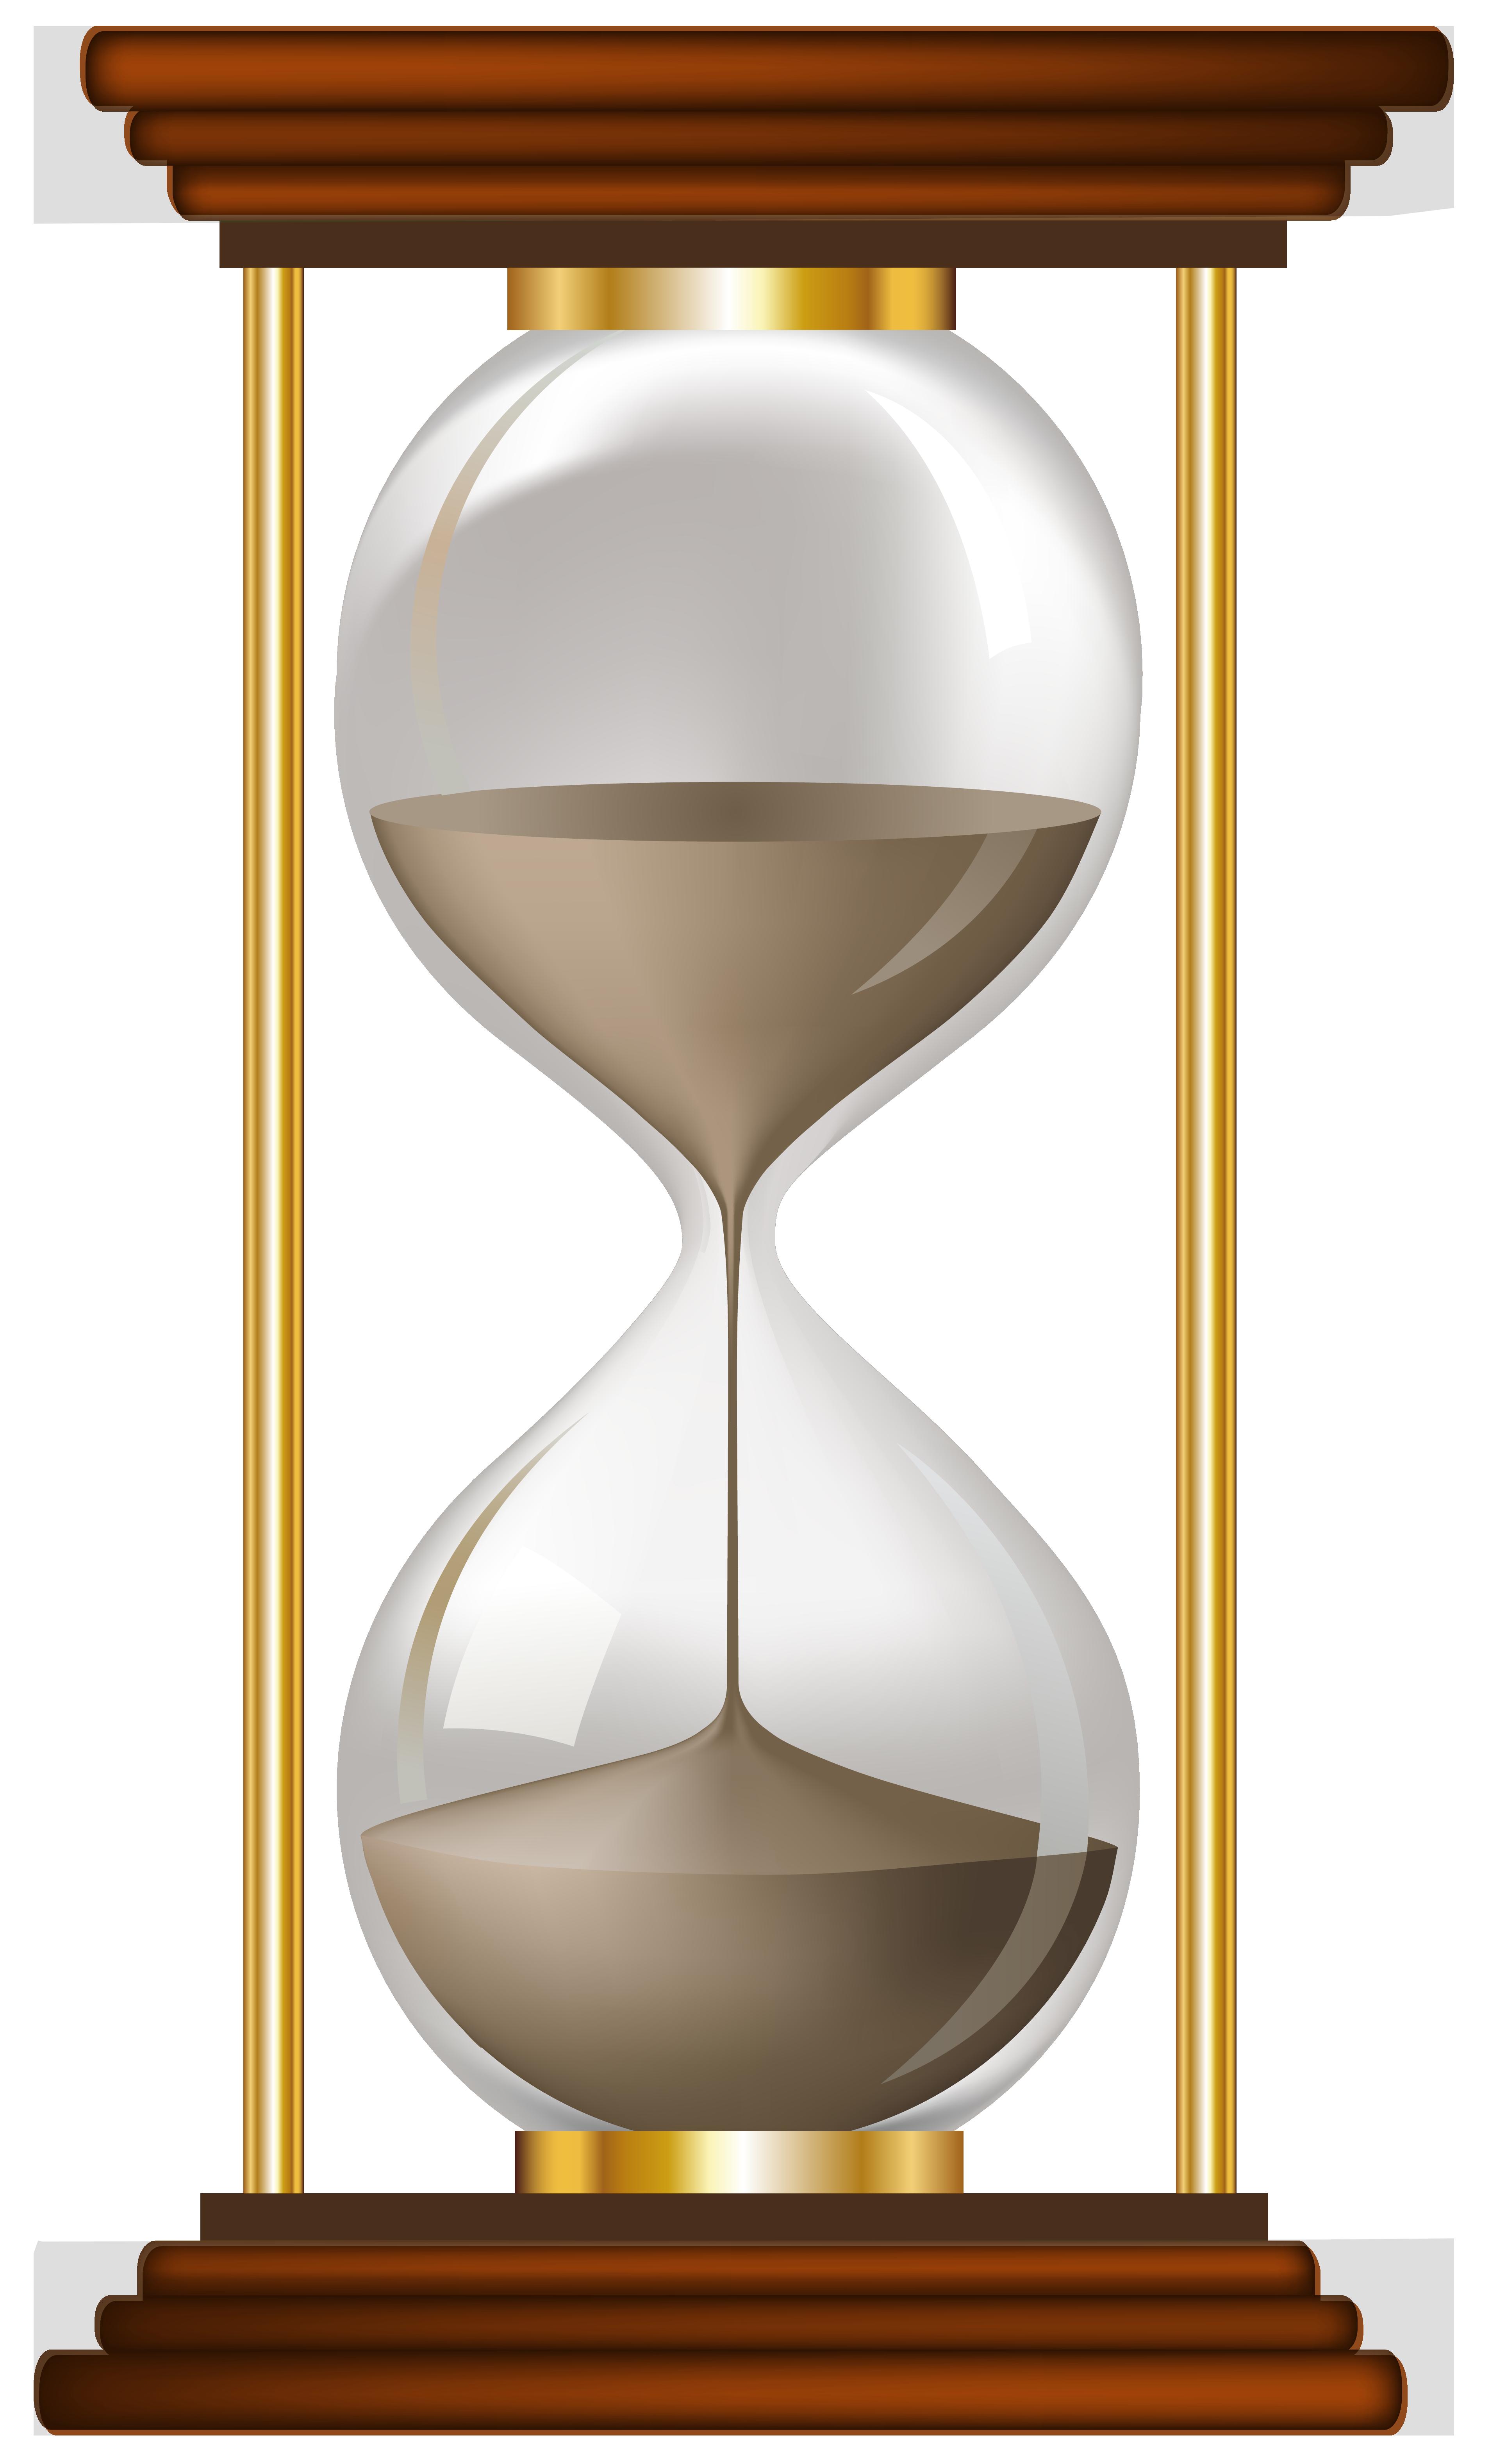 hight resolution of sand hourglass best web clipart art images sands clocks decoupage